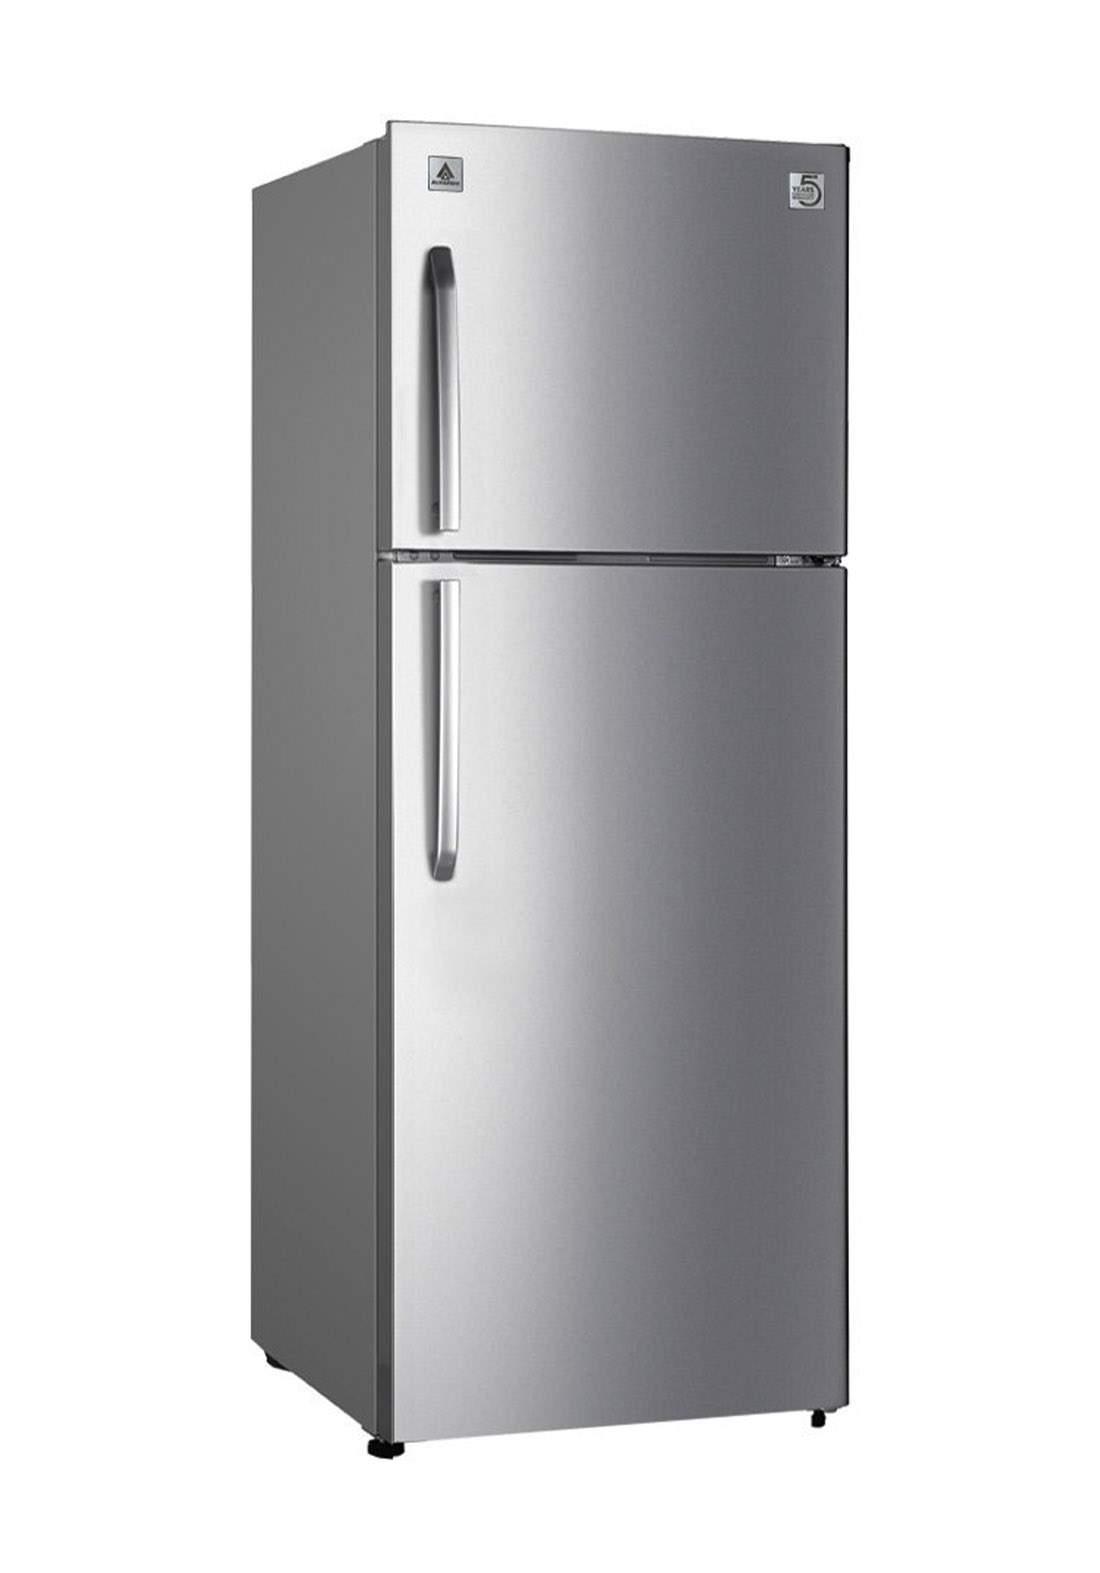 Alhafidh (RFHA-TM435NDS) 15cu.Ft. No Frost Top Mount Refrigerator ثلاجة باب واحد